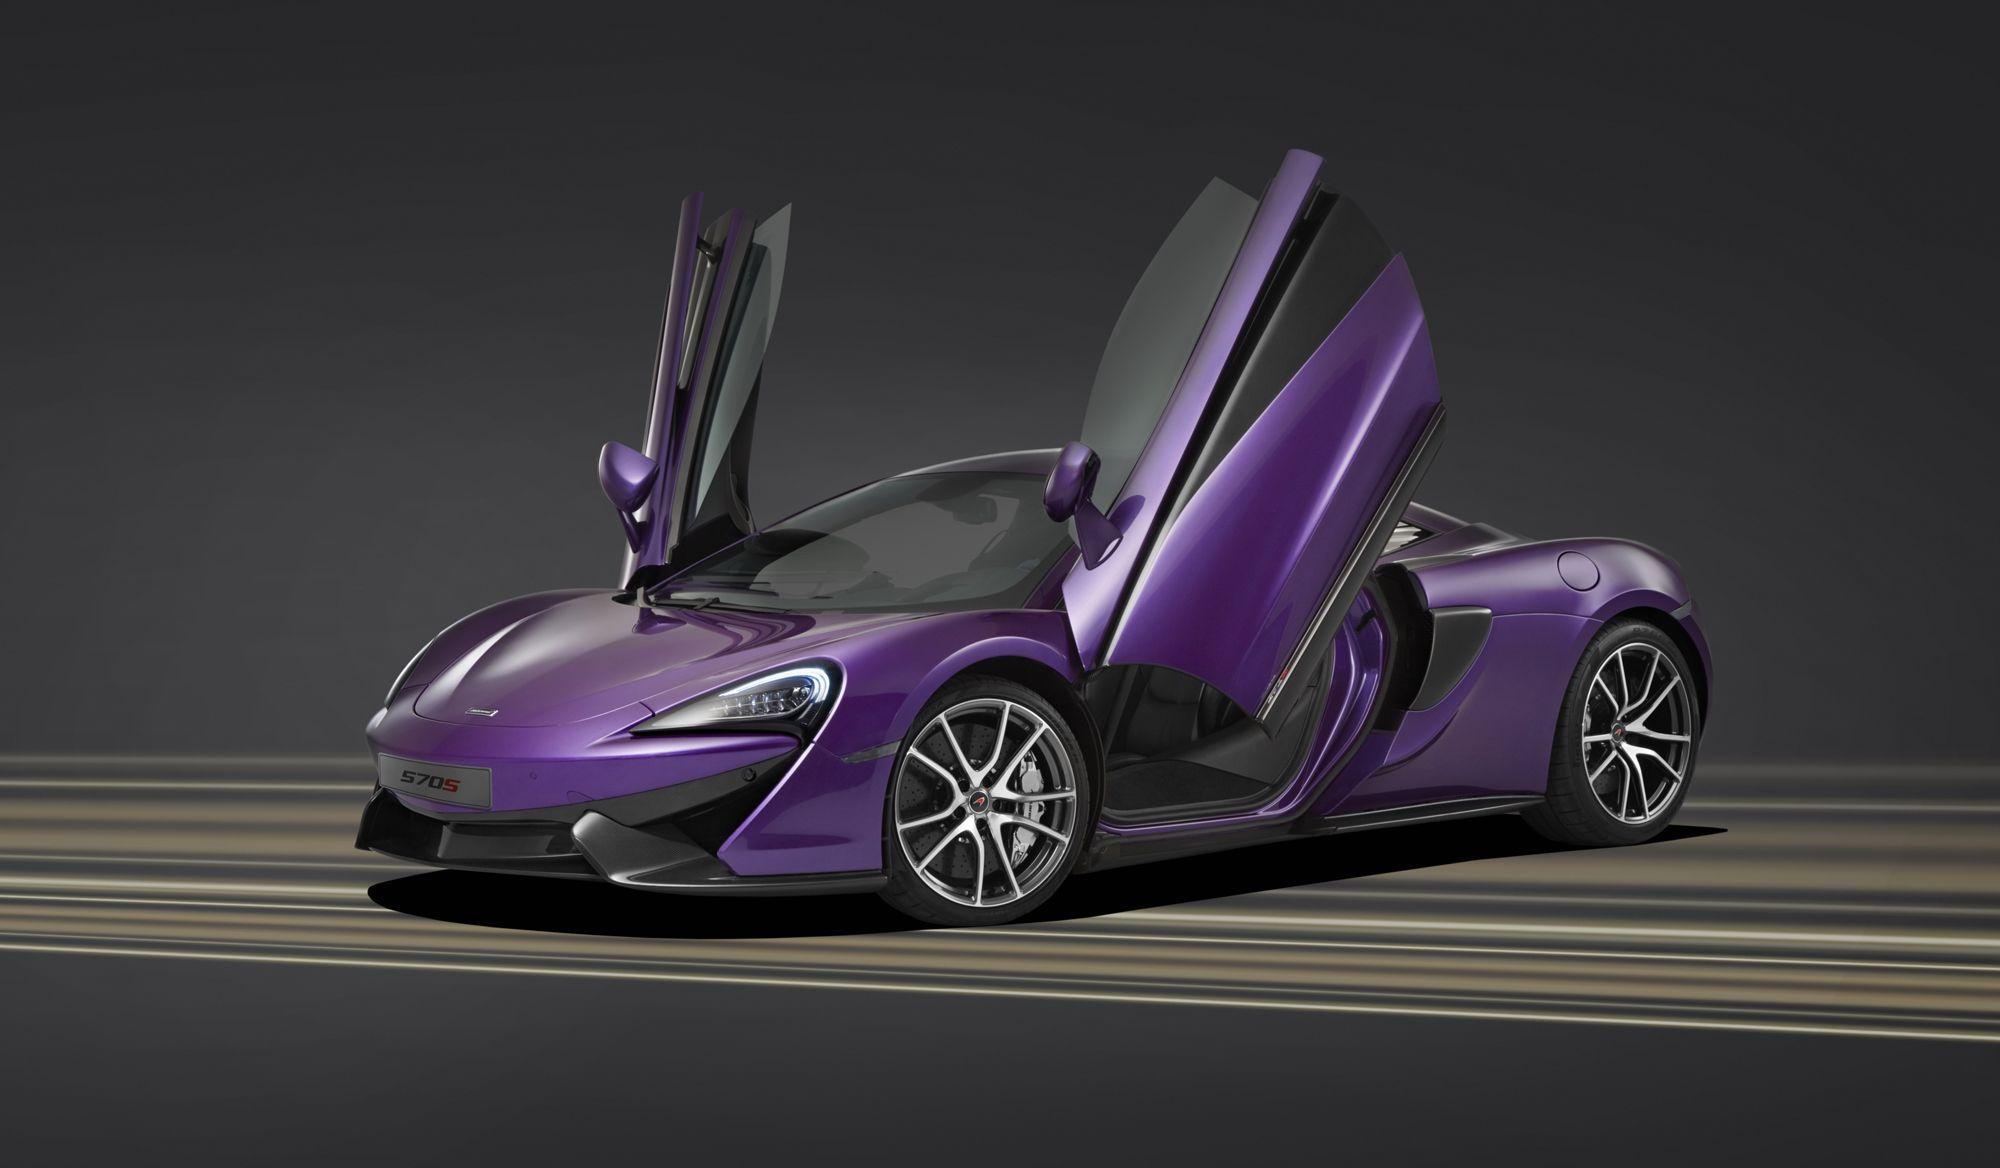 McLaren Automotive Limited, pebble beach